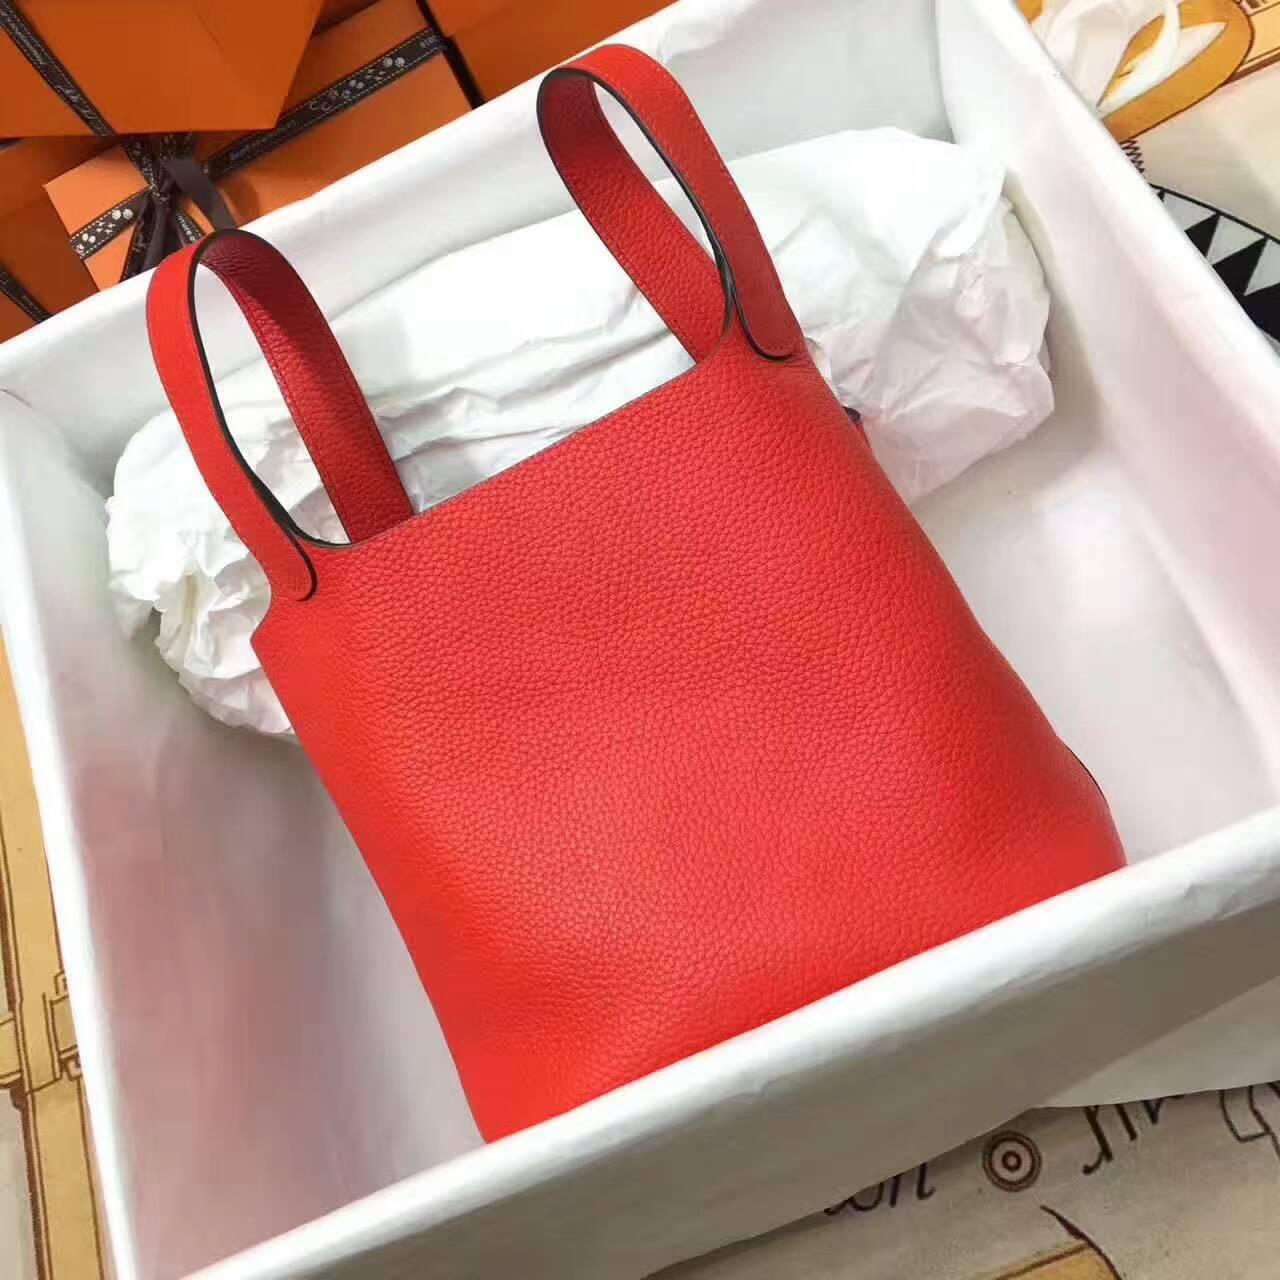 Hermes菜篮子 手工蜡线 18-22cm Togo皮 爱马仕红 时尚又实用